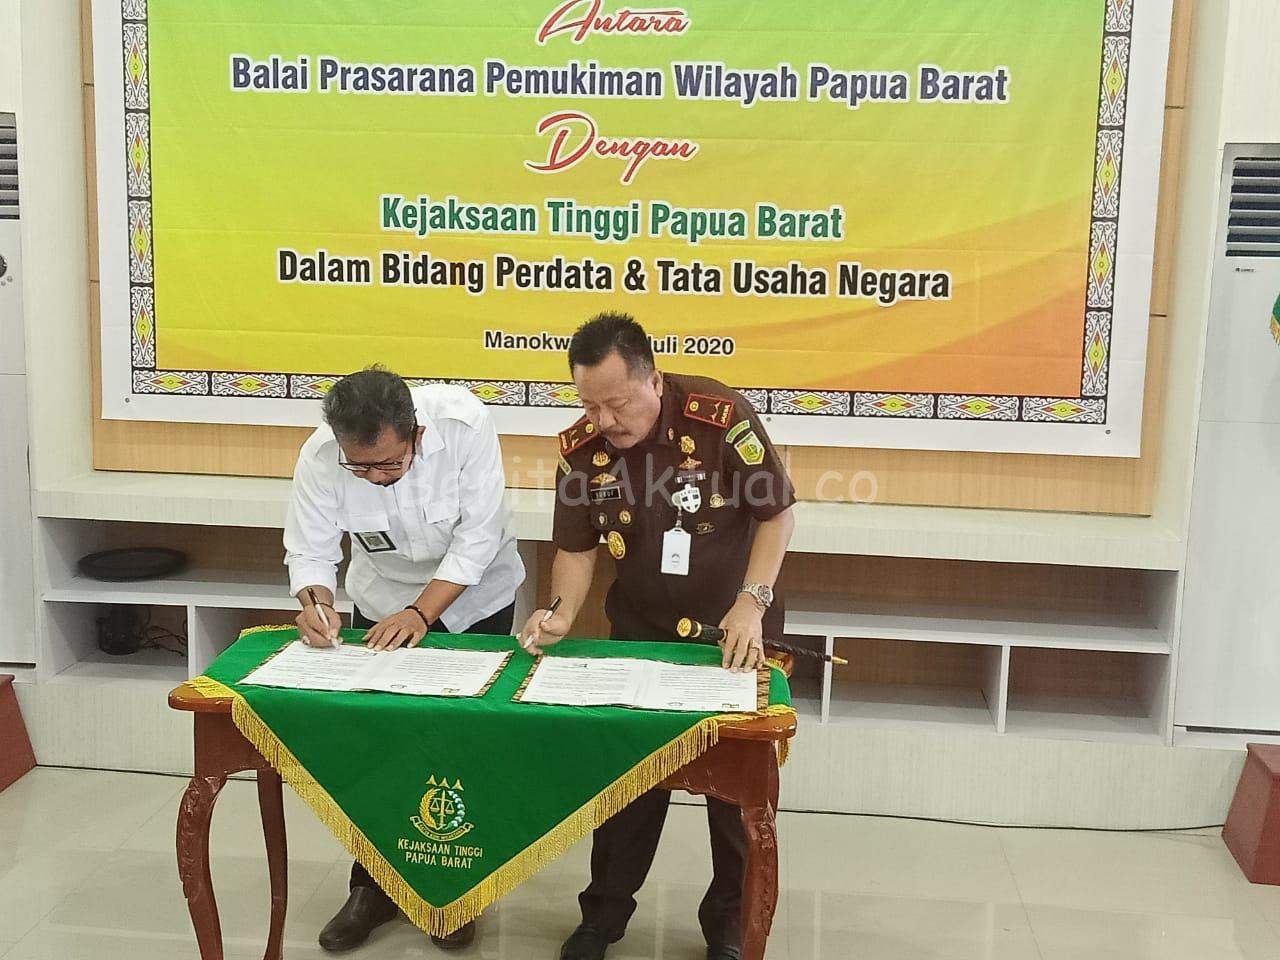 Kawal Proyek Strategis, BPPW PB Dan Kejati Papua Barat Teken MoU 23 IMG 20200715 WA0026